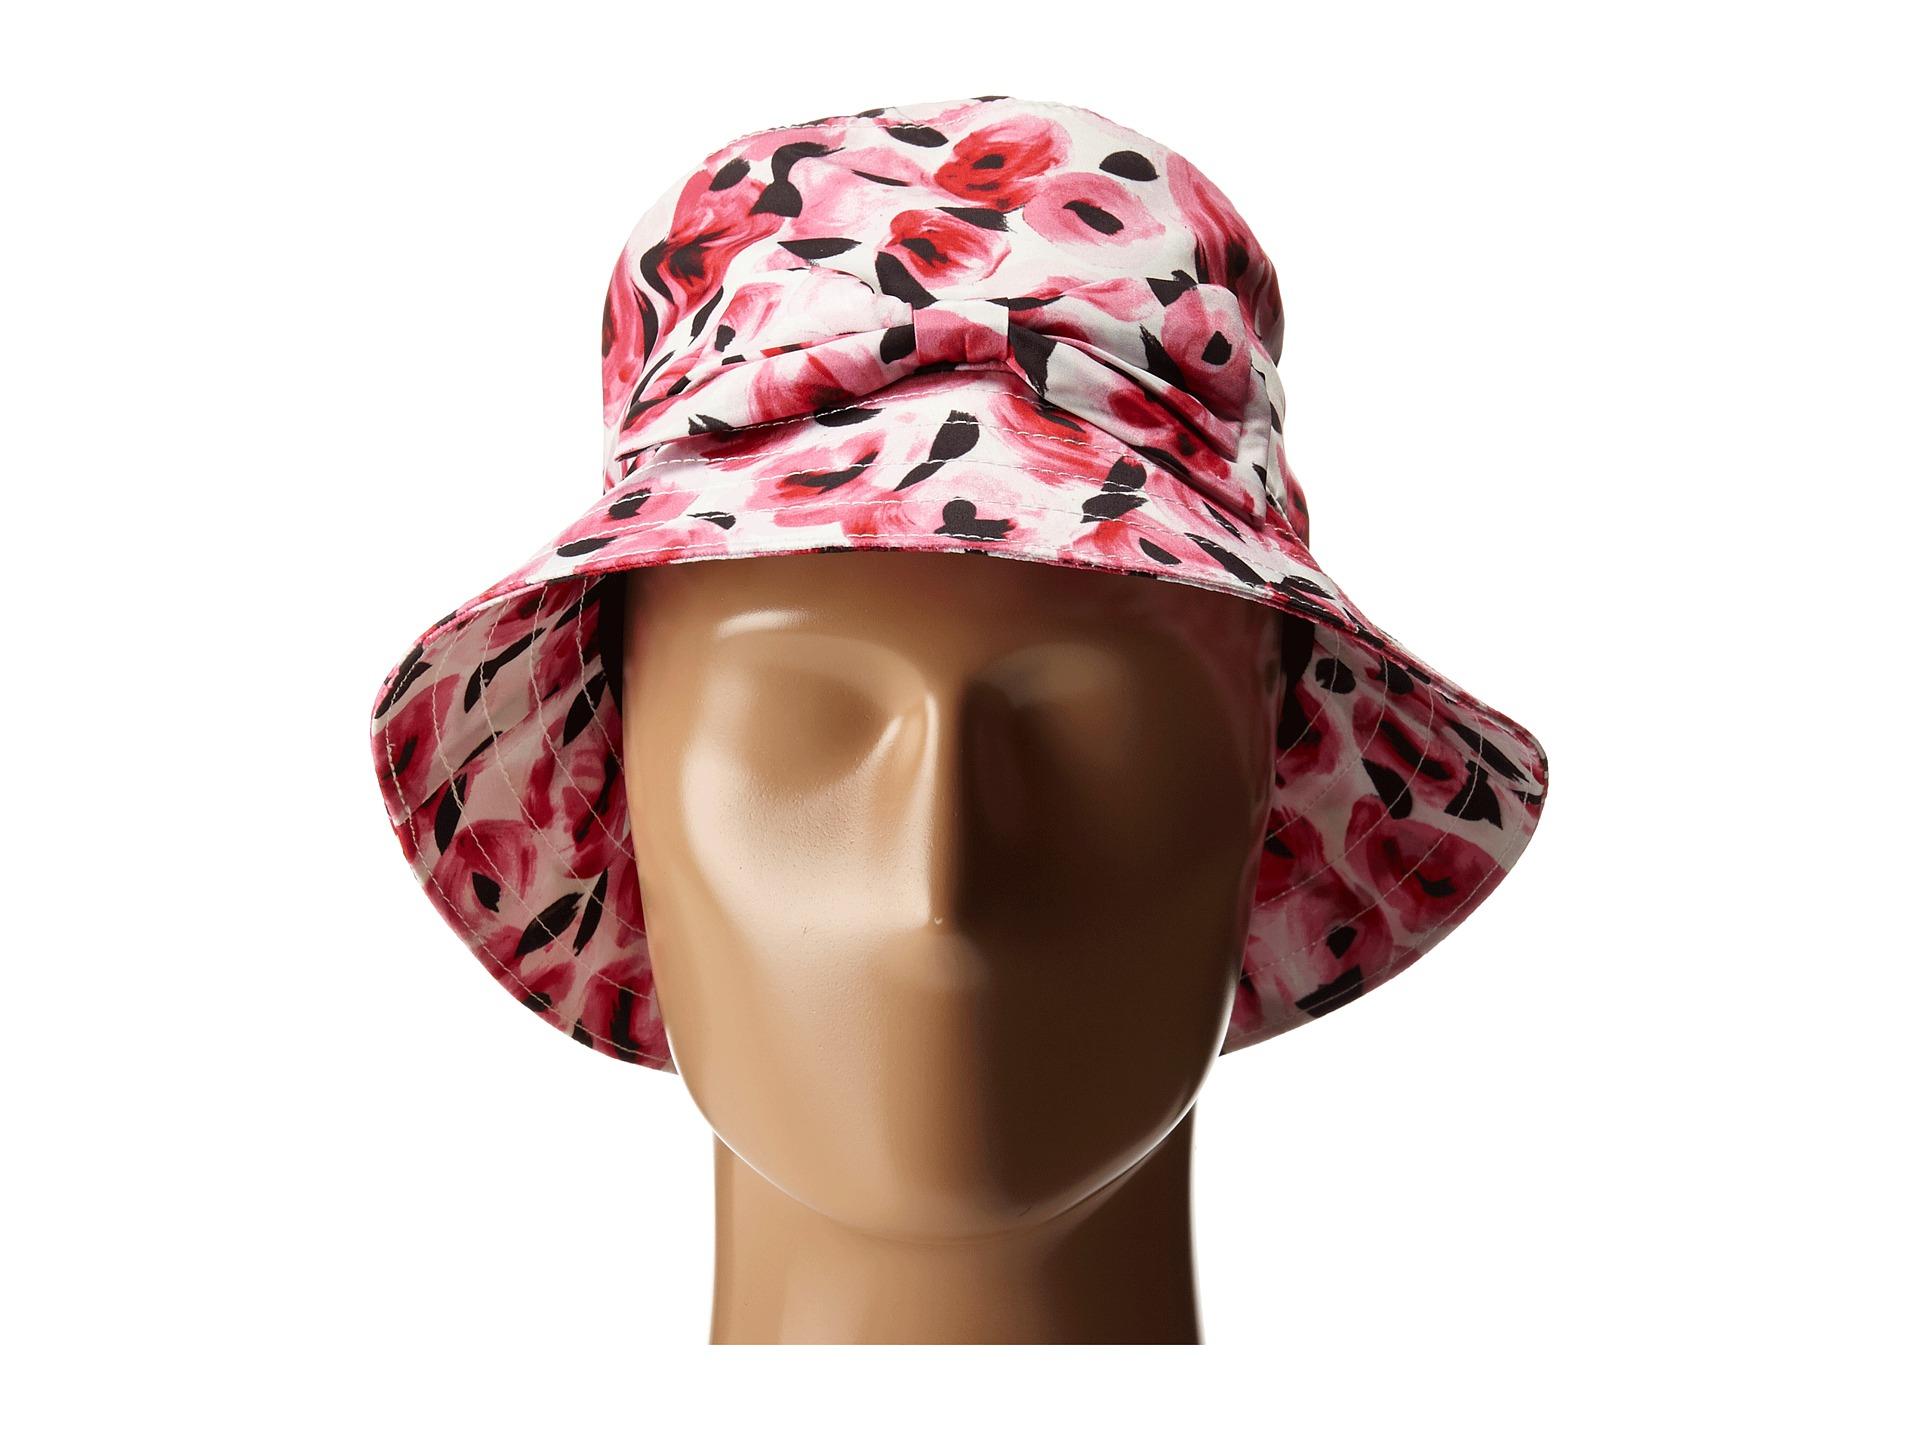 c45b2cd793a Lyst kate spade new york printed rain bucket hat in pink jpg 1920x1440  Printed rain hats